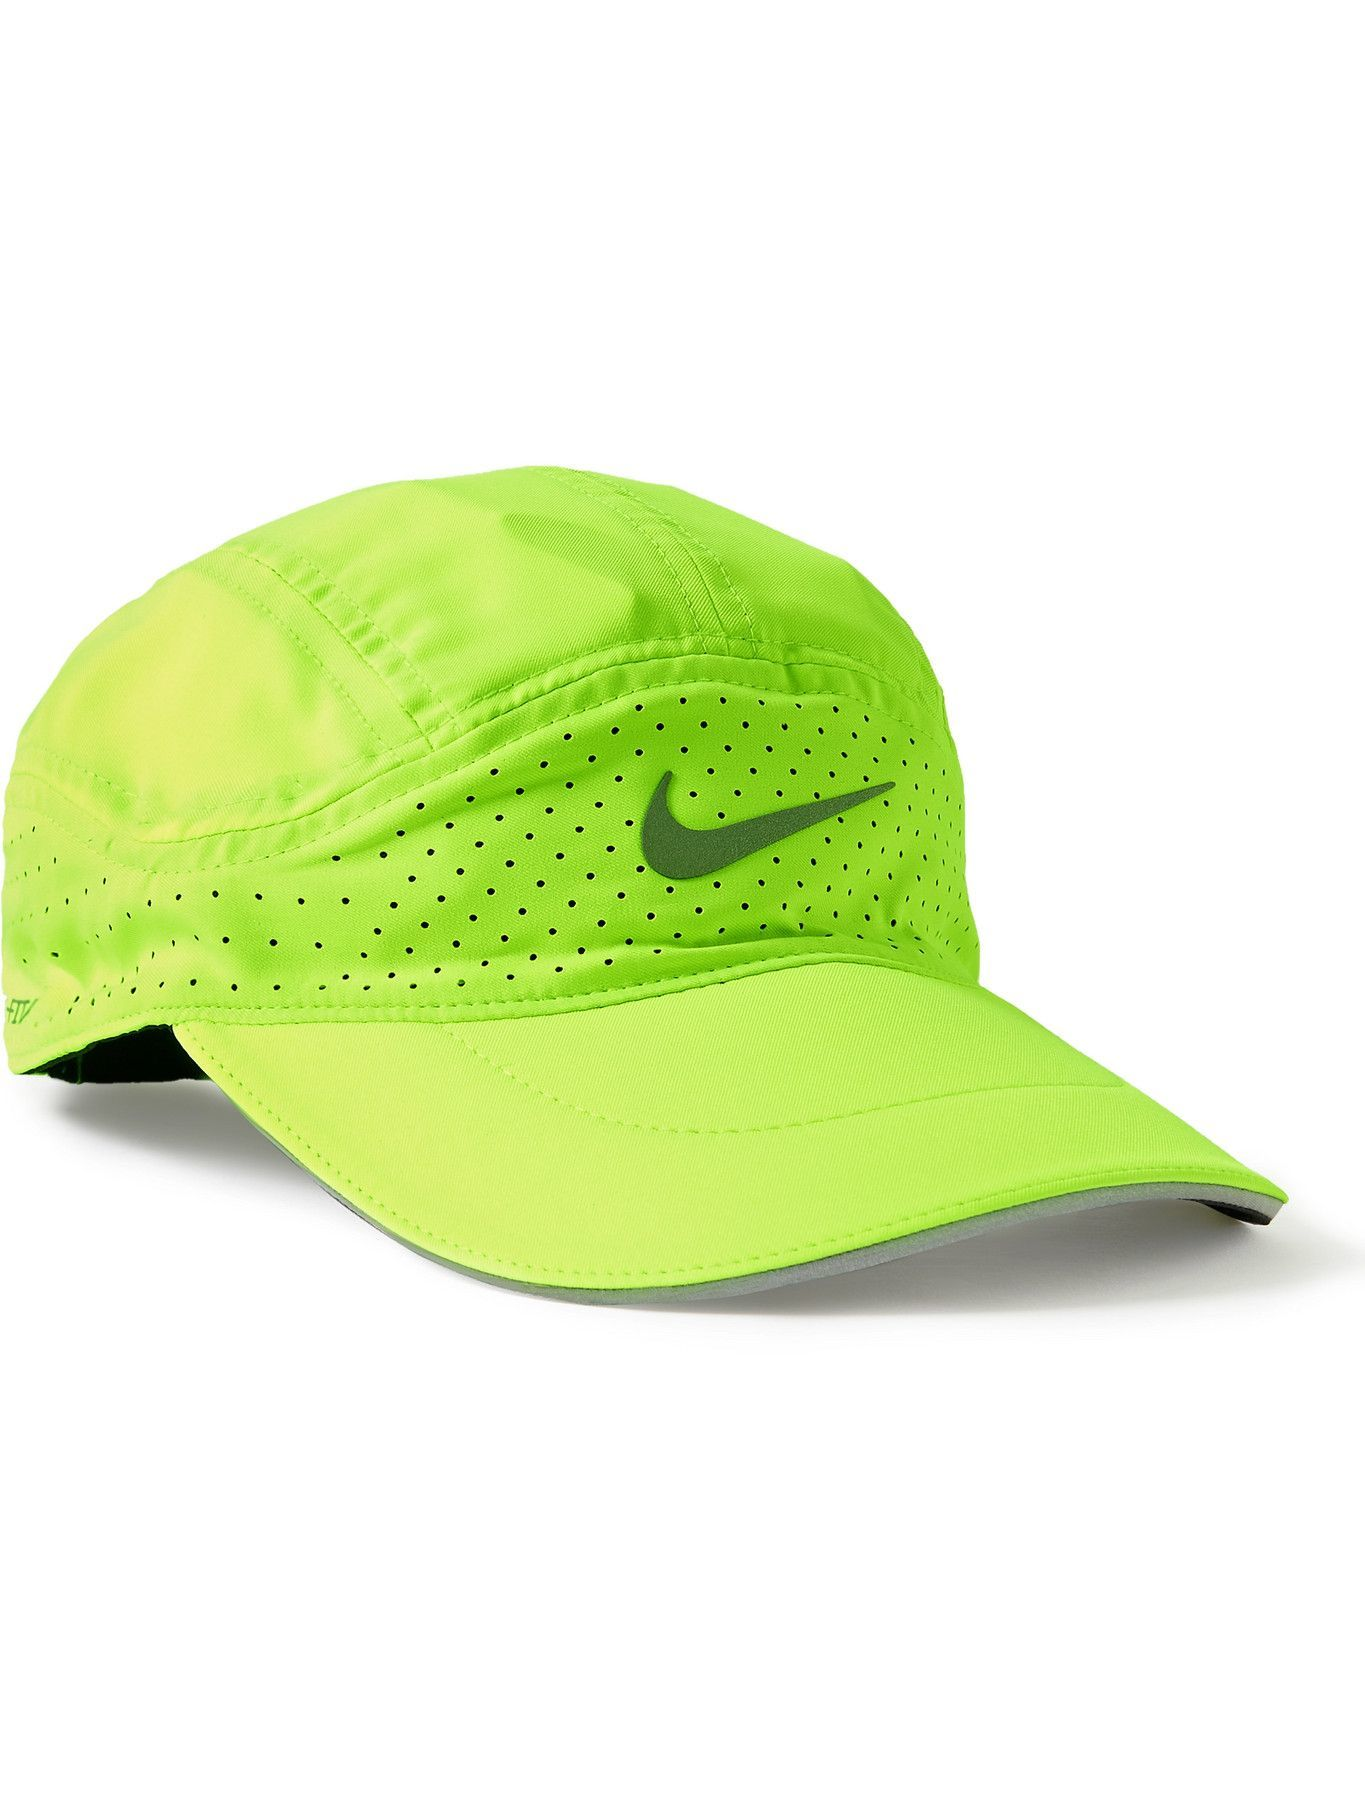 Photo: Nike Running - AeroBill Tailwind Recycled Dri-FIT and Mesh Baseball Cap